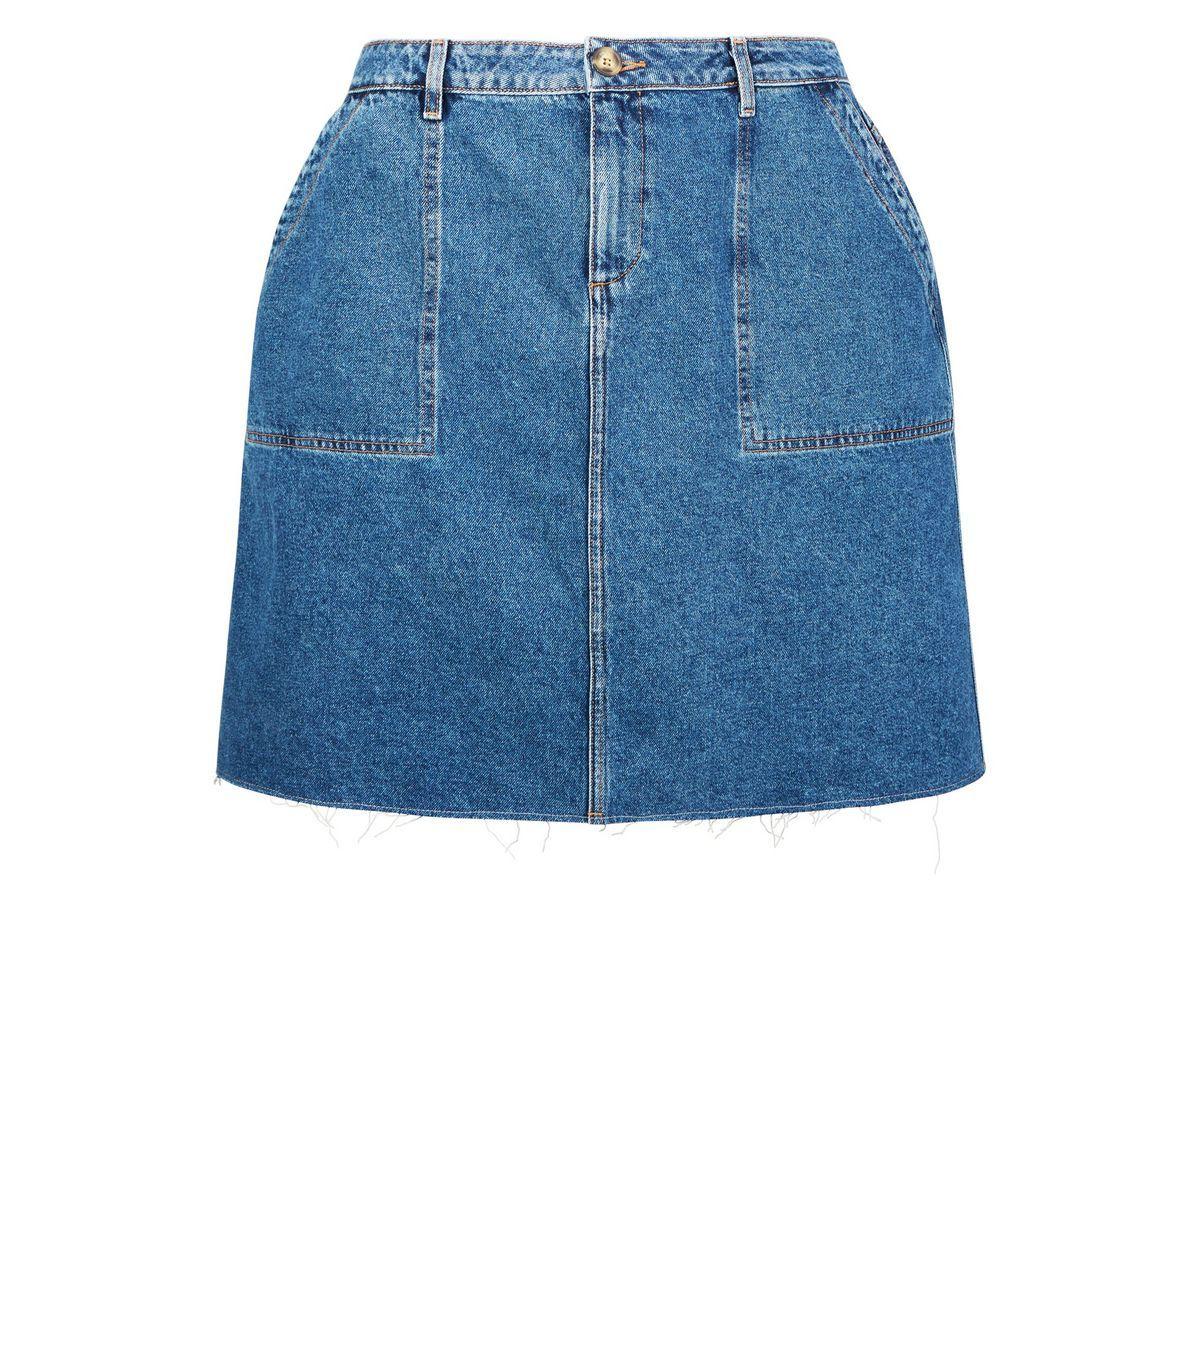 5d54c1ca9fbb2 Curves Blue Raw Hem Denim Utility Skirt i 2018